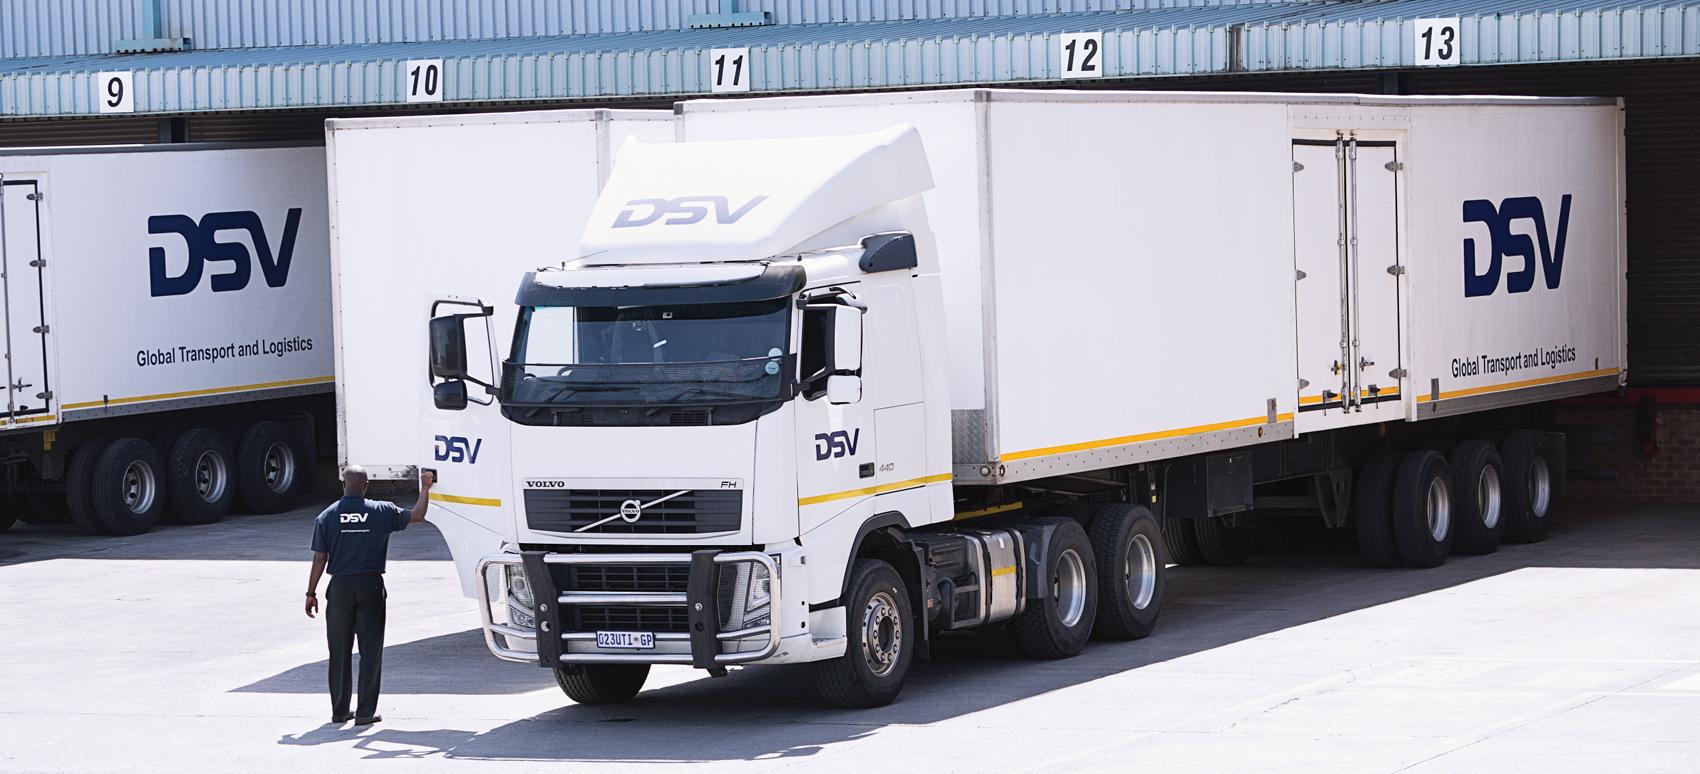 DSV's generation licence application